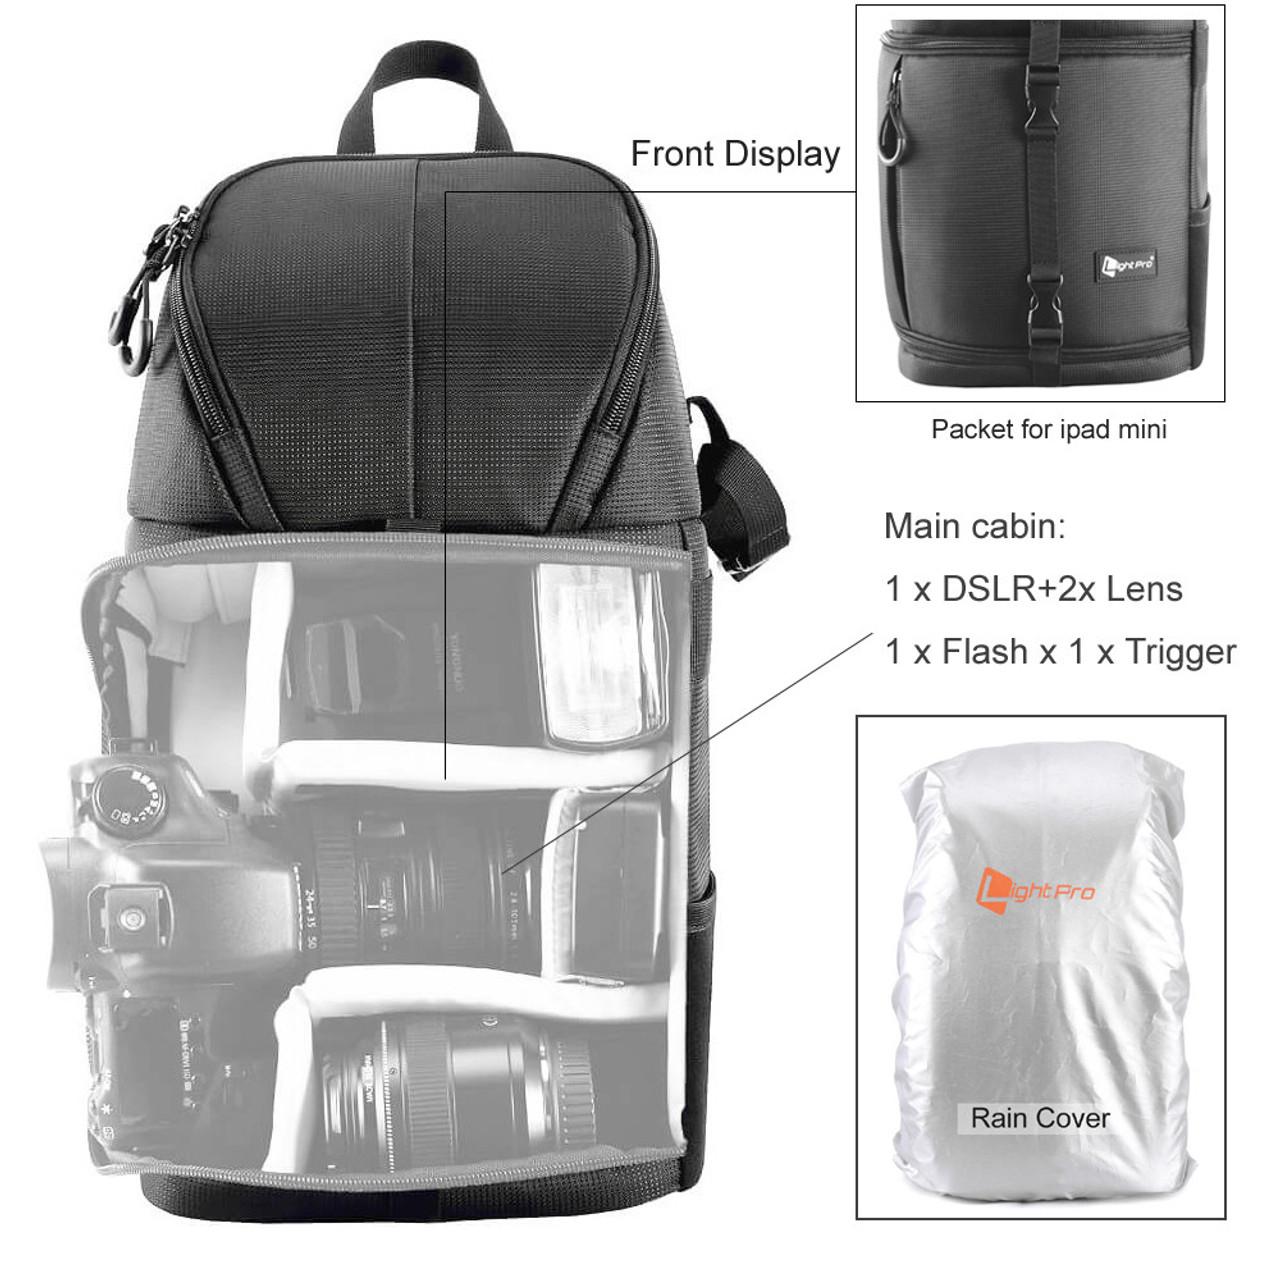 91cddbc6f41 ... Camera Sling Bag Shoulder Cross DSLR Case Waterproof w  Rain Cover  Camera Sling Soft Padded ...